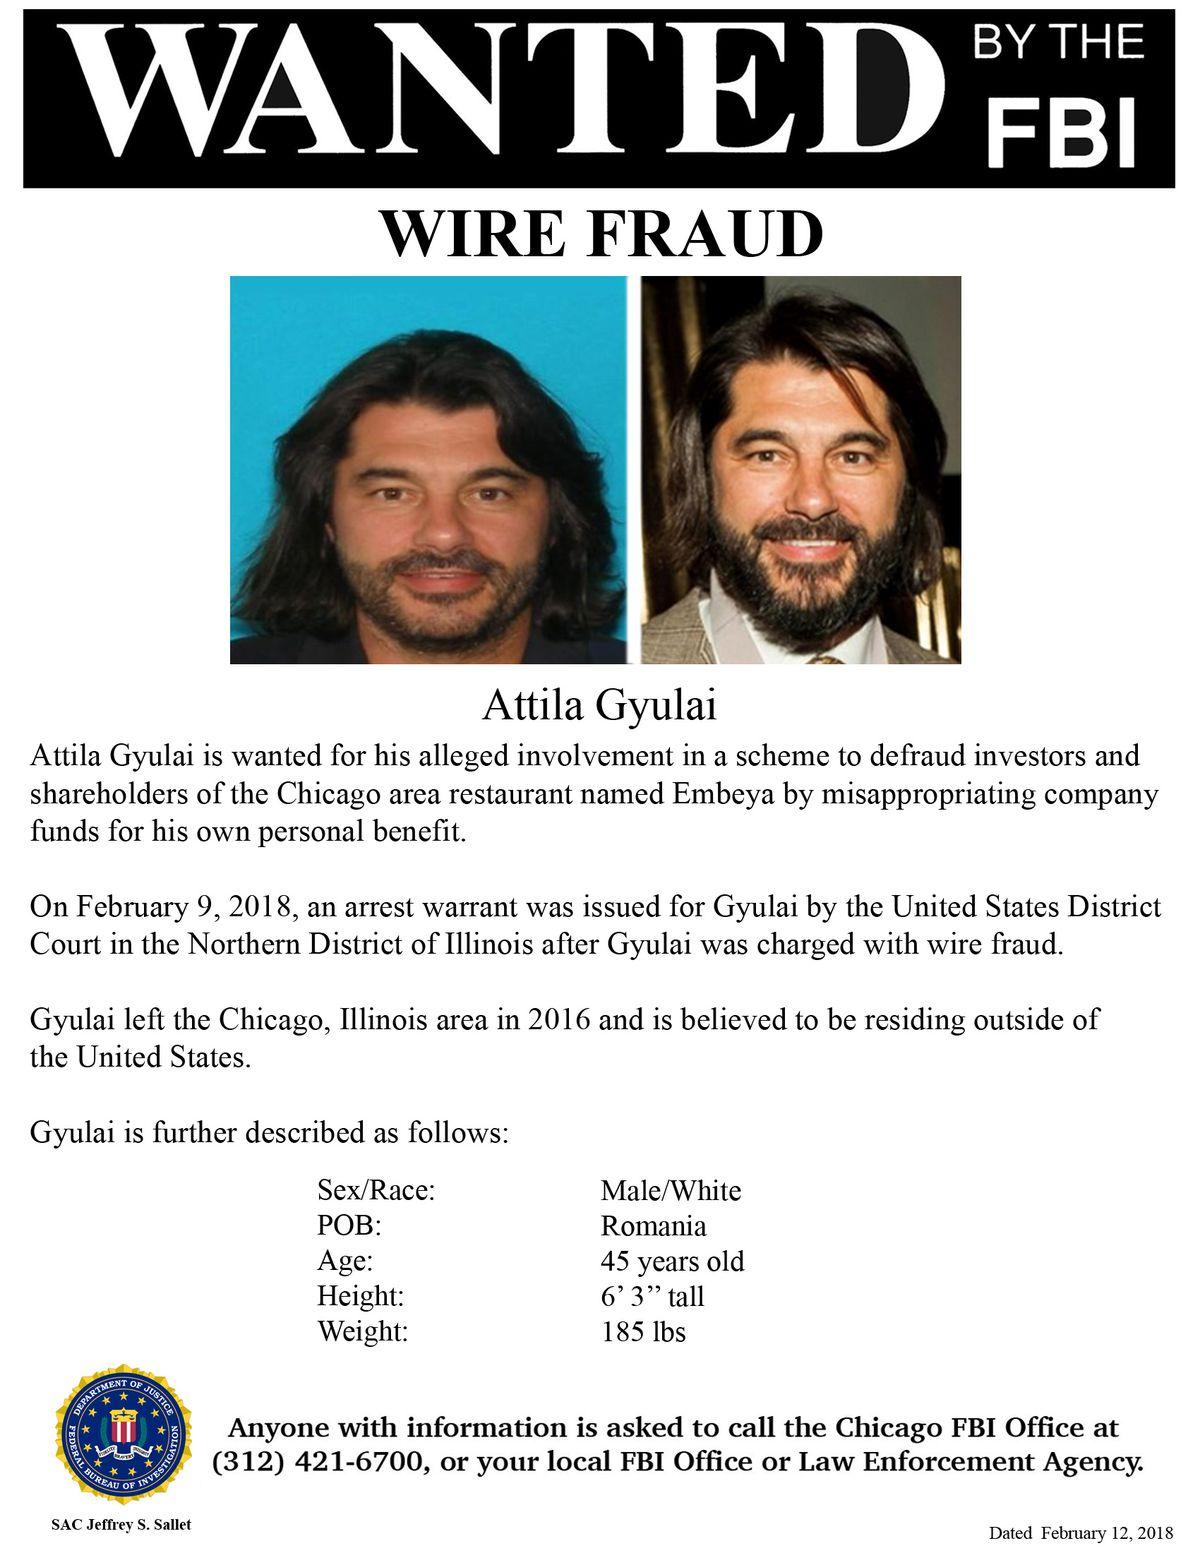 FBI wanted poster for Attila Gyulai